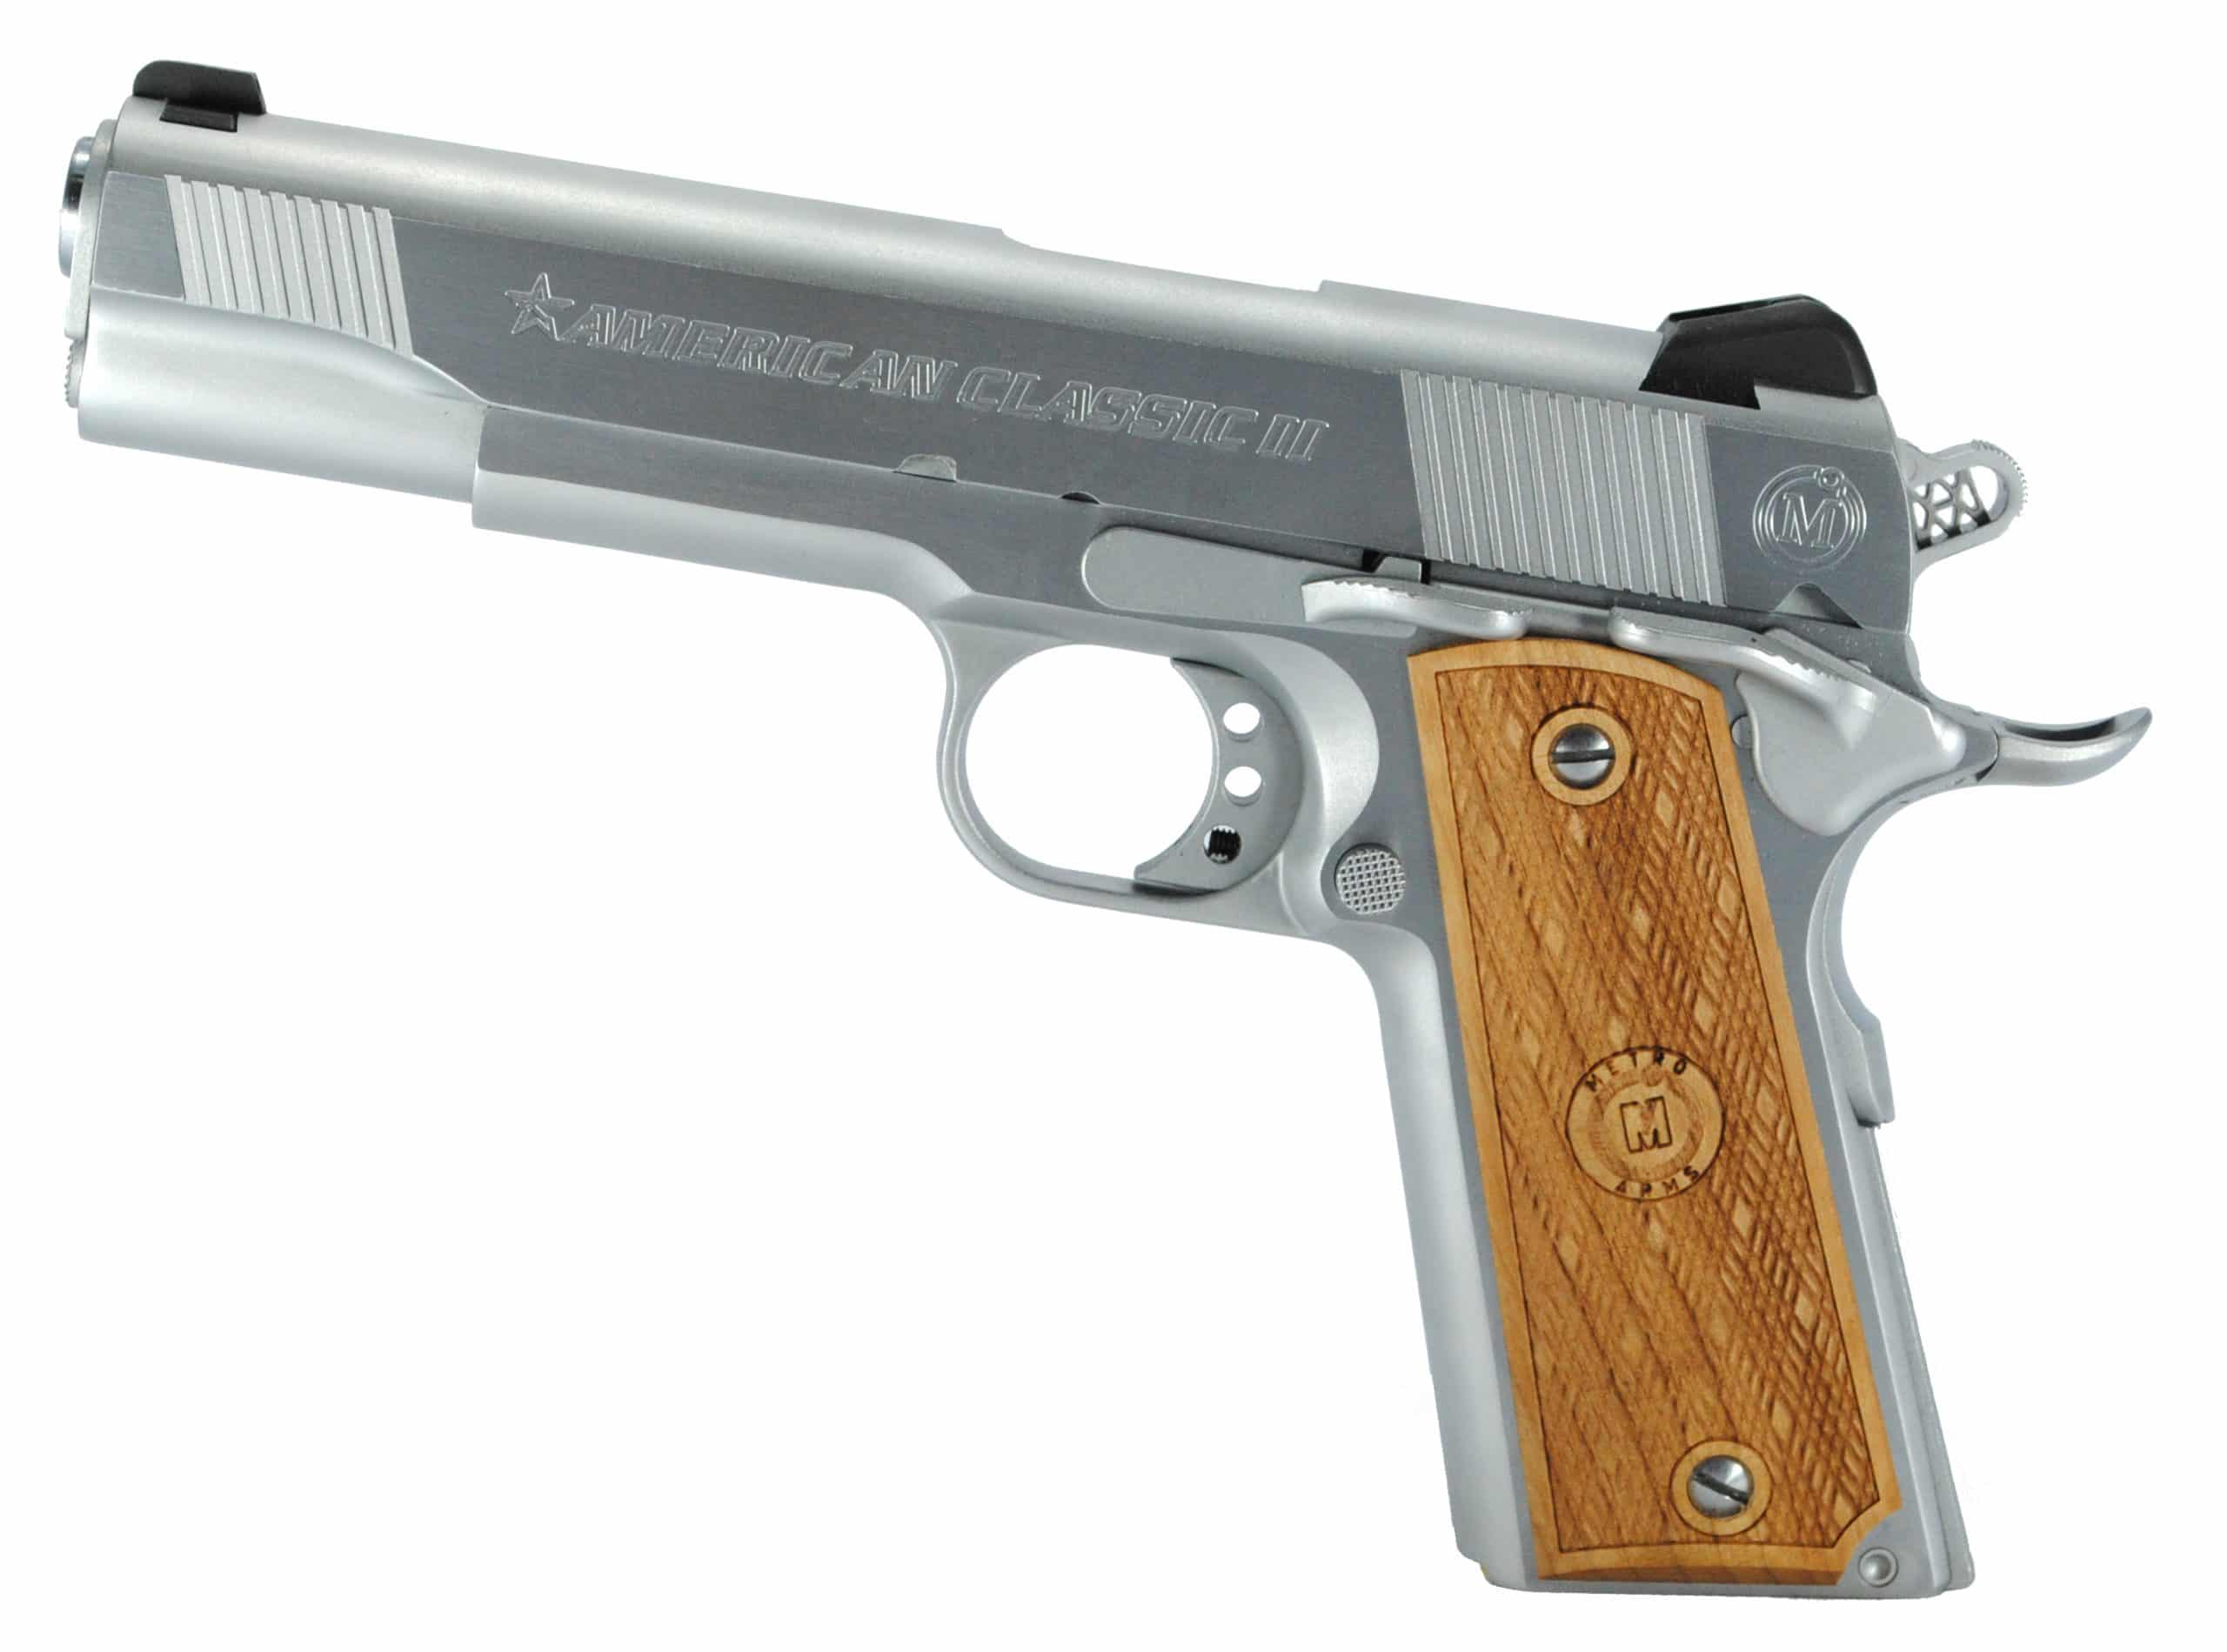 image of Metro Arms American Classic II 1911